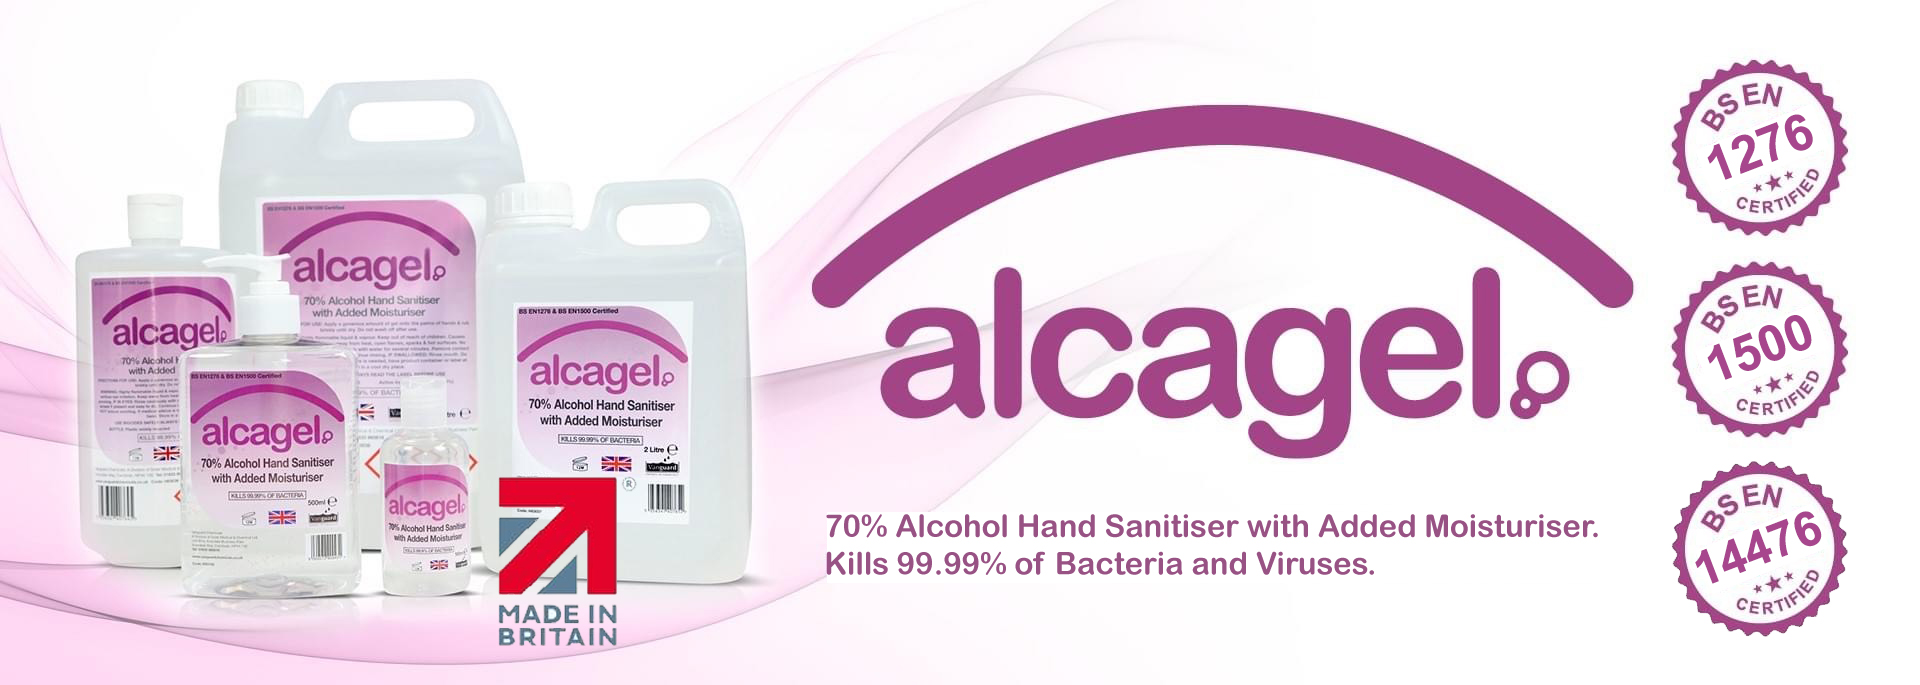 Alcagel - Alcohol Hand Sanitiser